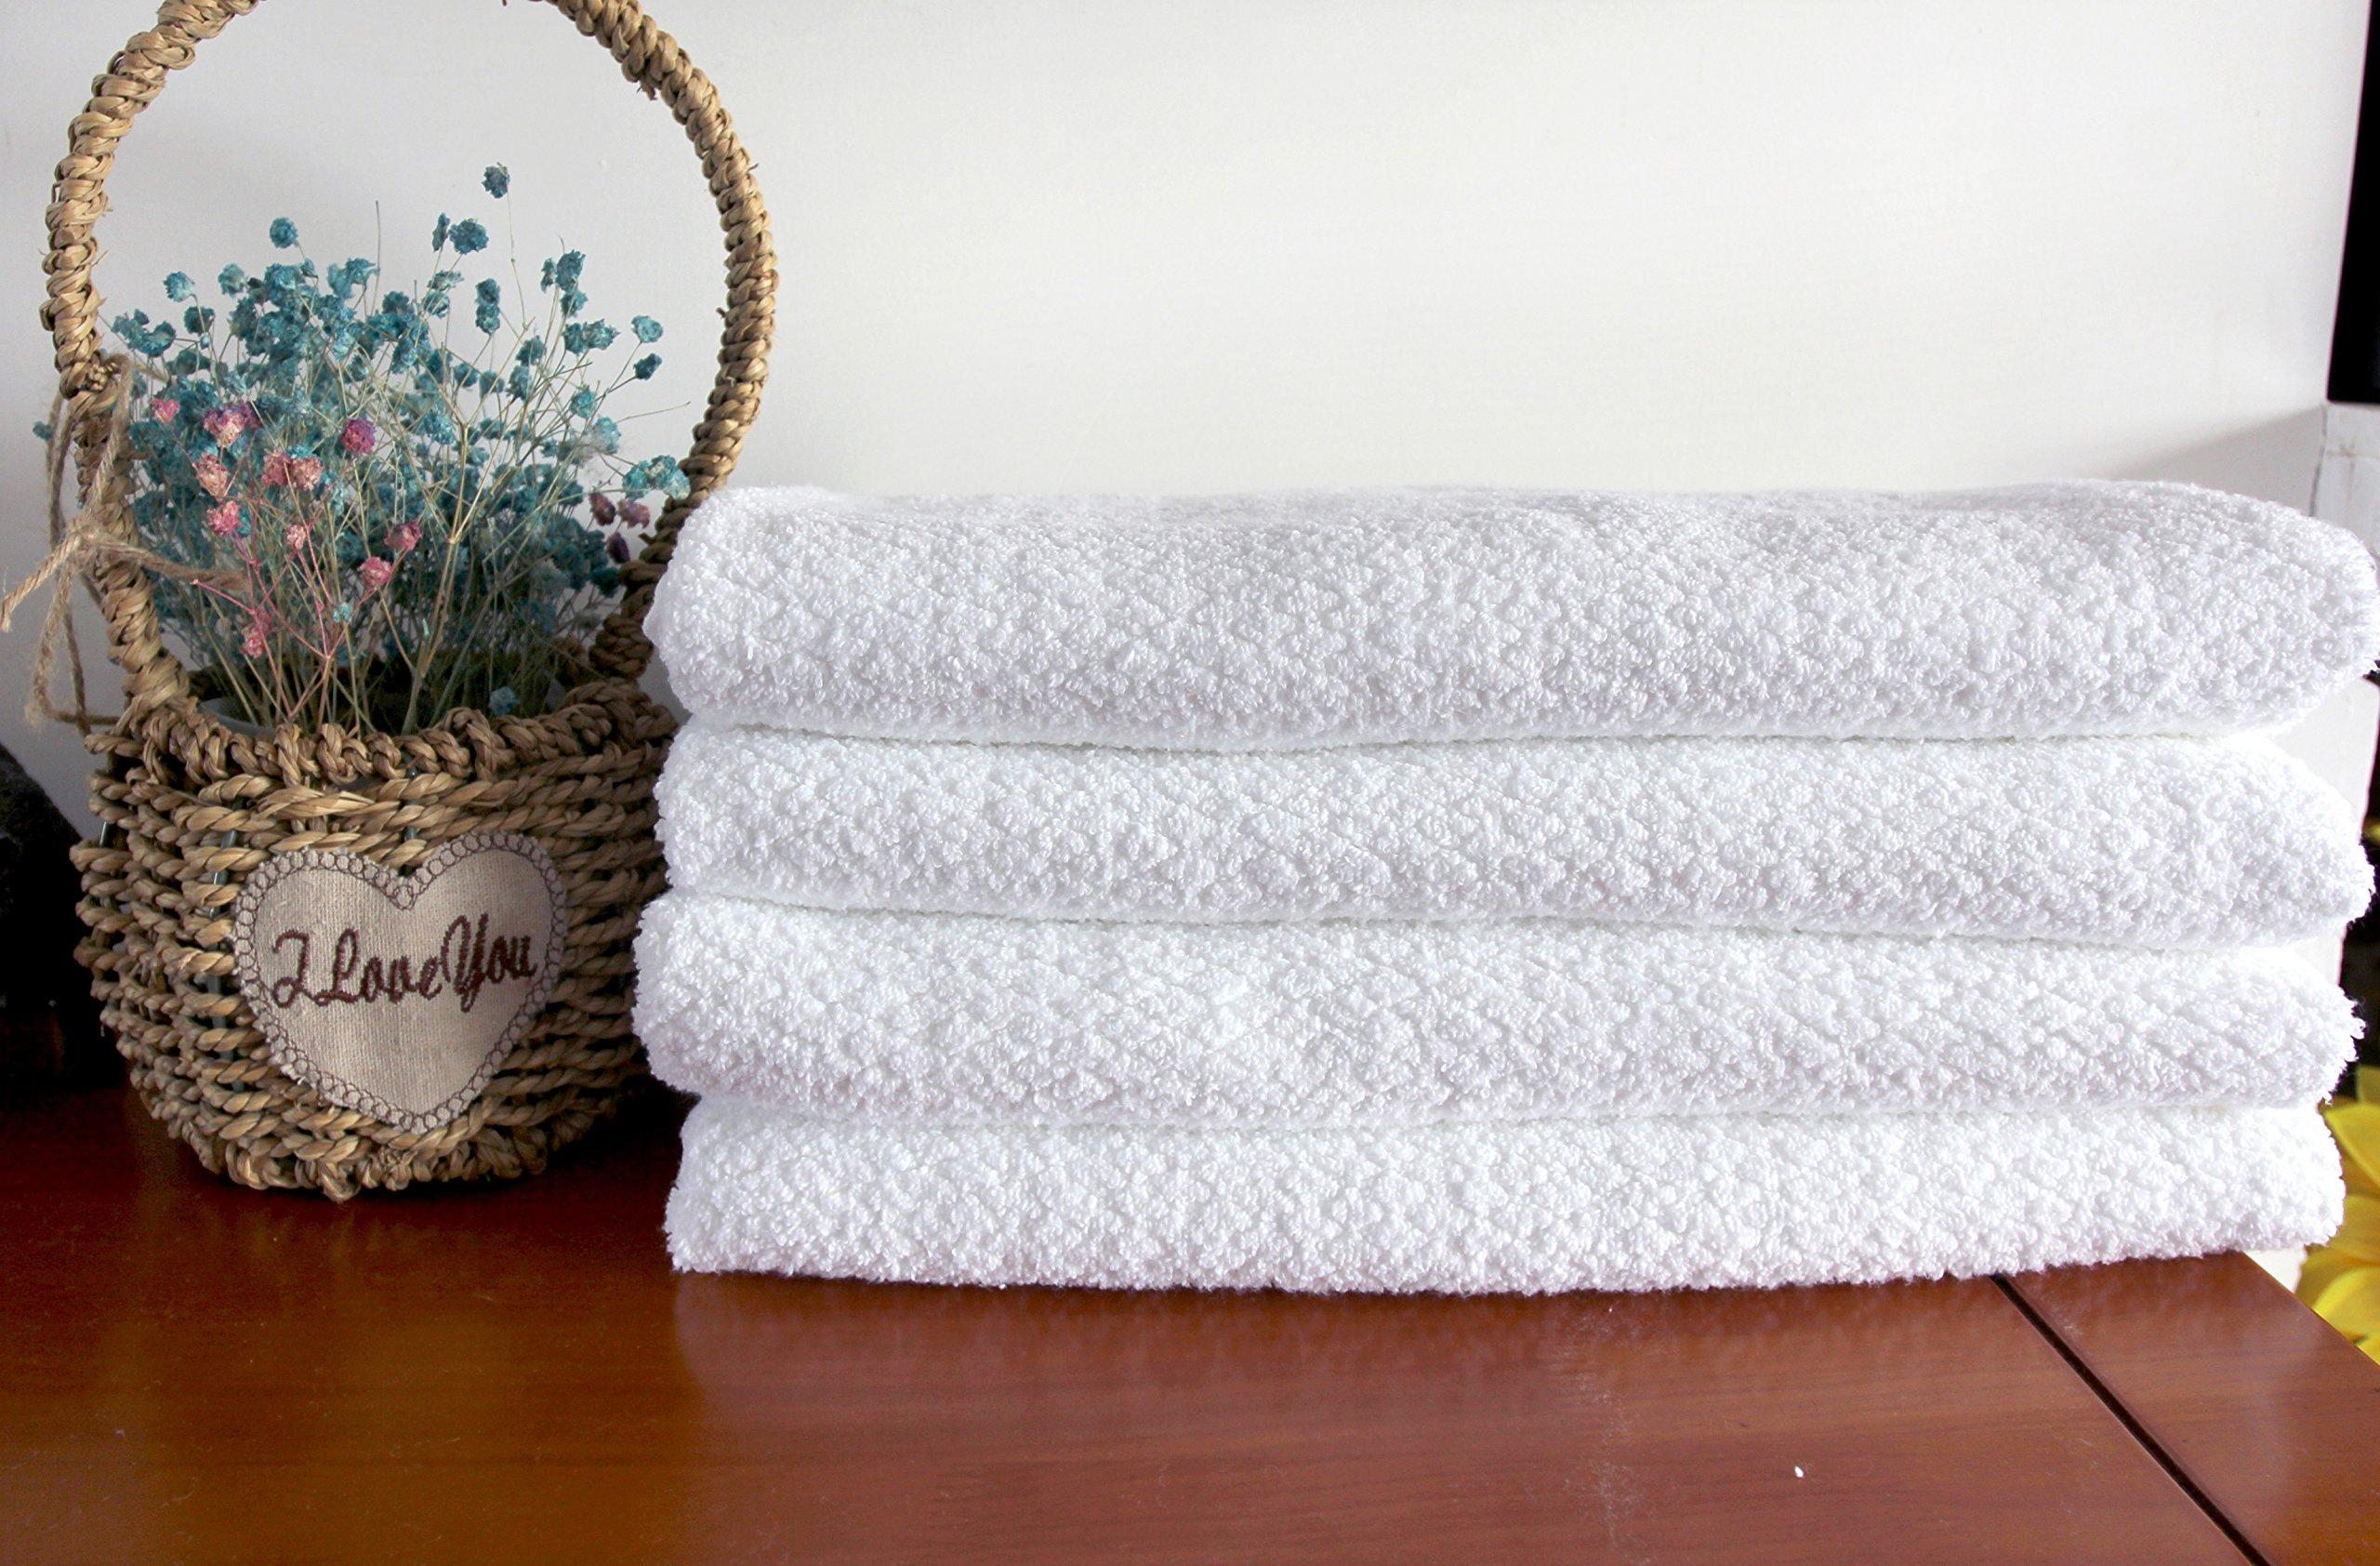 Everplush Diamond Jacquard Bath Sheet 2 Pack in White by Everplush (Image #5)